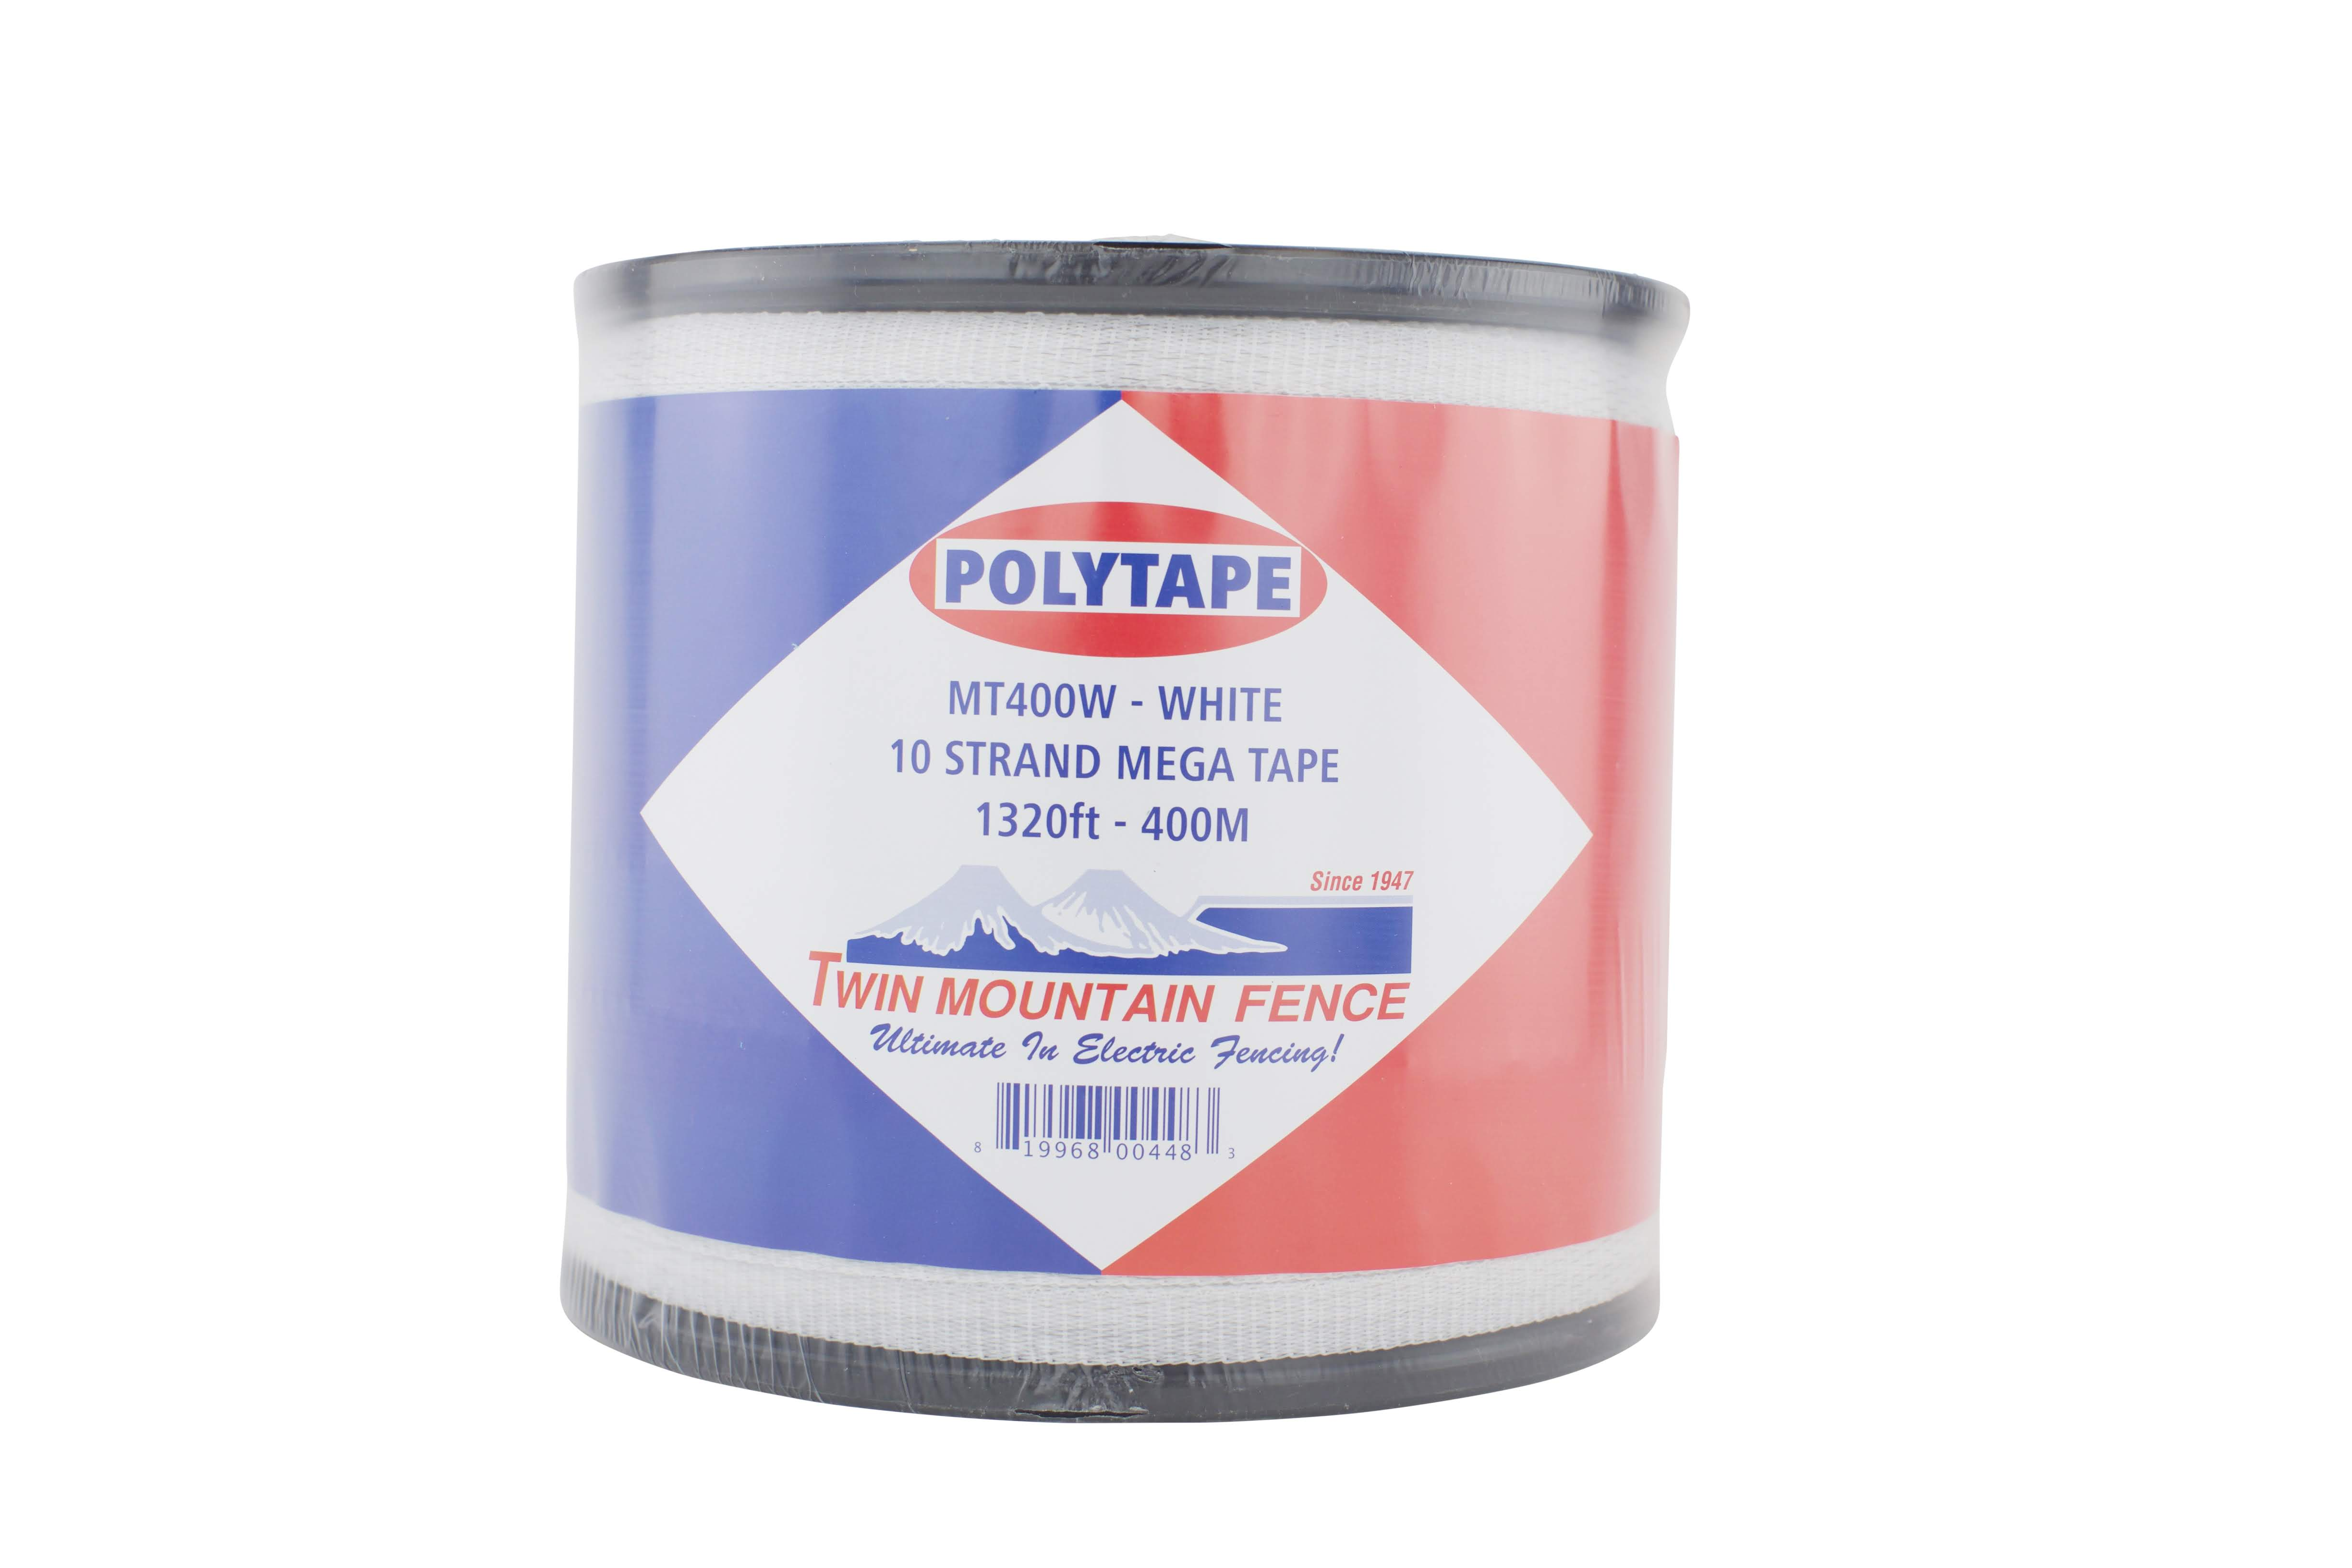 1,320' Mega Tape - White